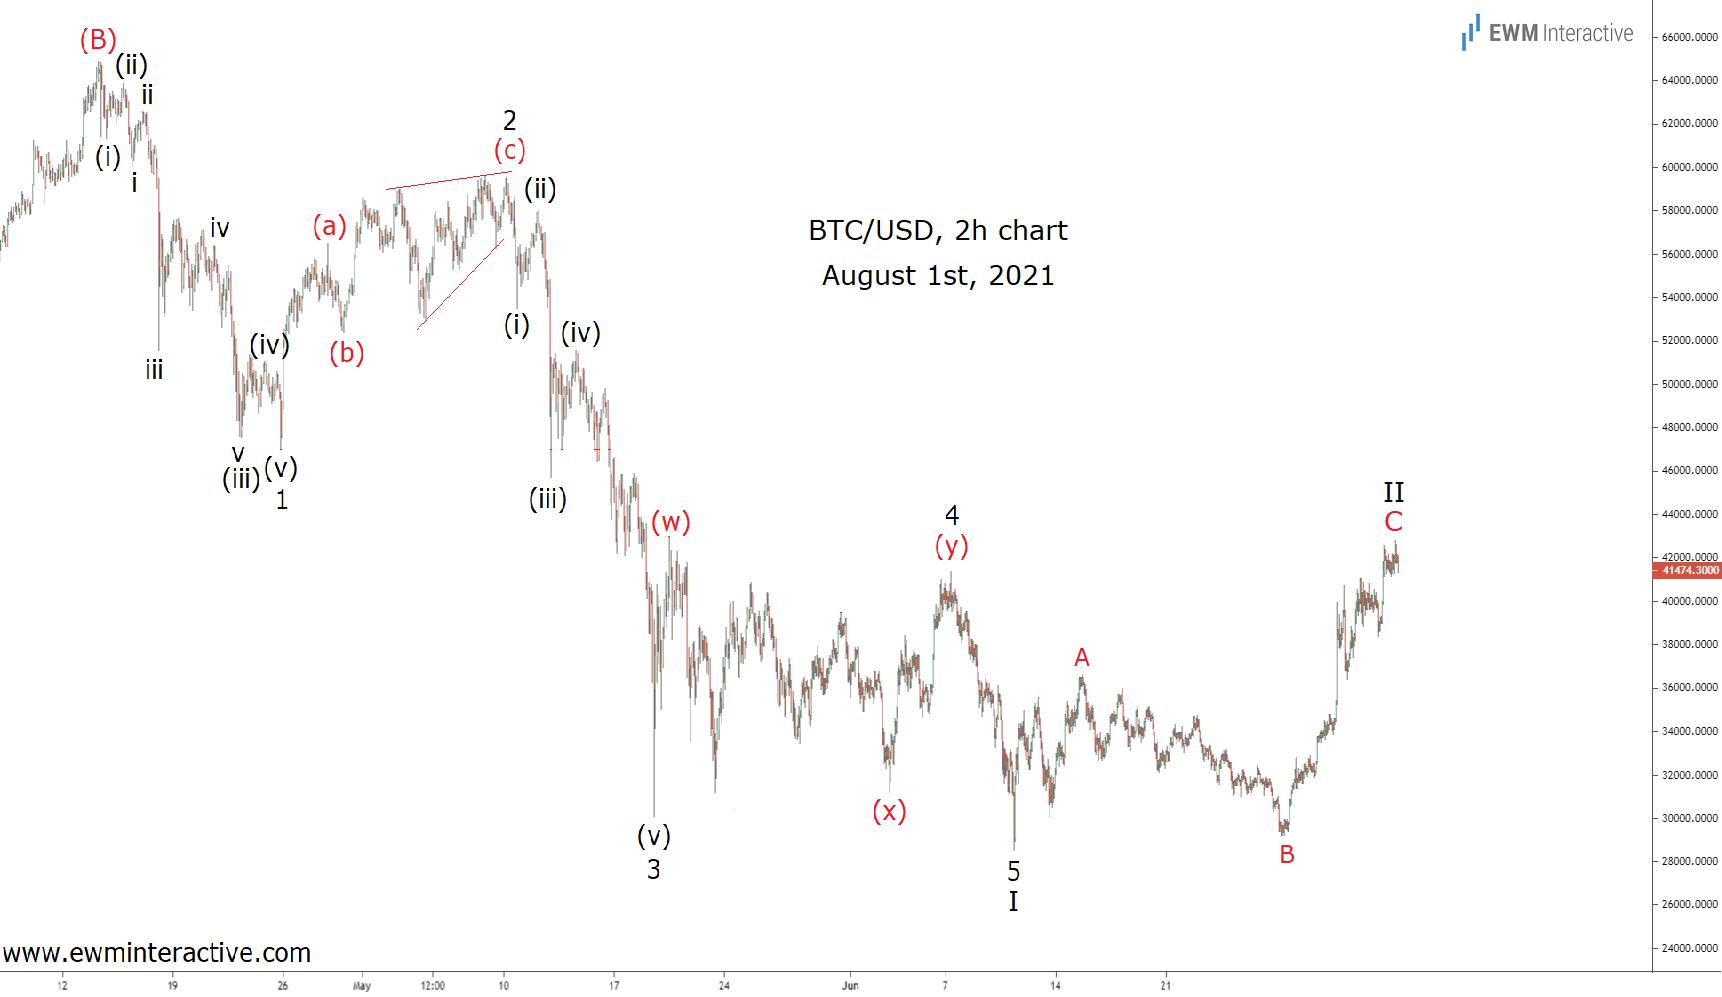 Completing the bearish Elliott Wave cycle